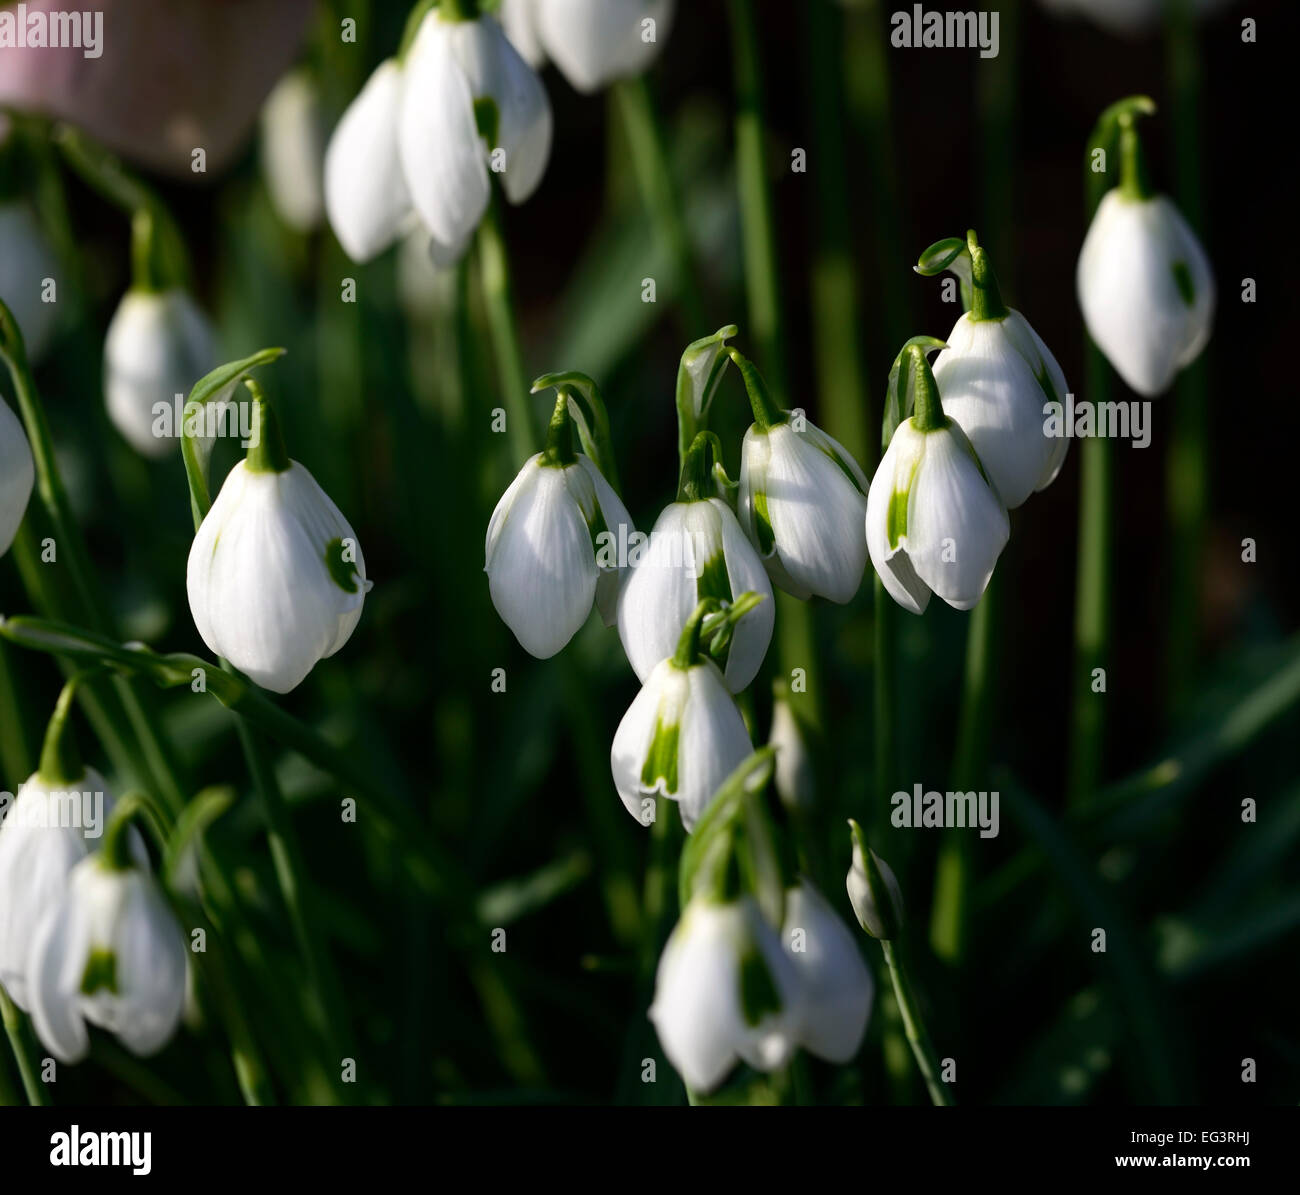 galanthus cordelia greatorex double snowdrops flowers green markings